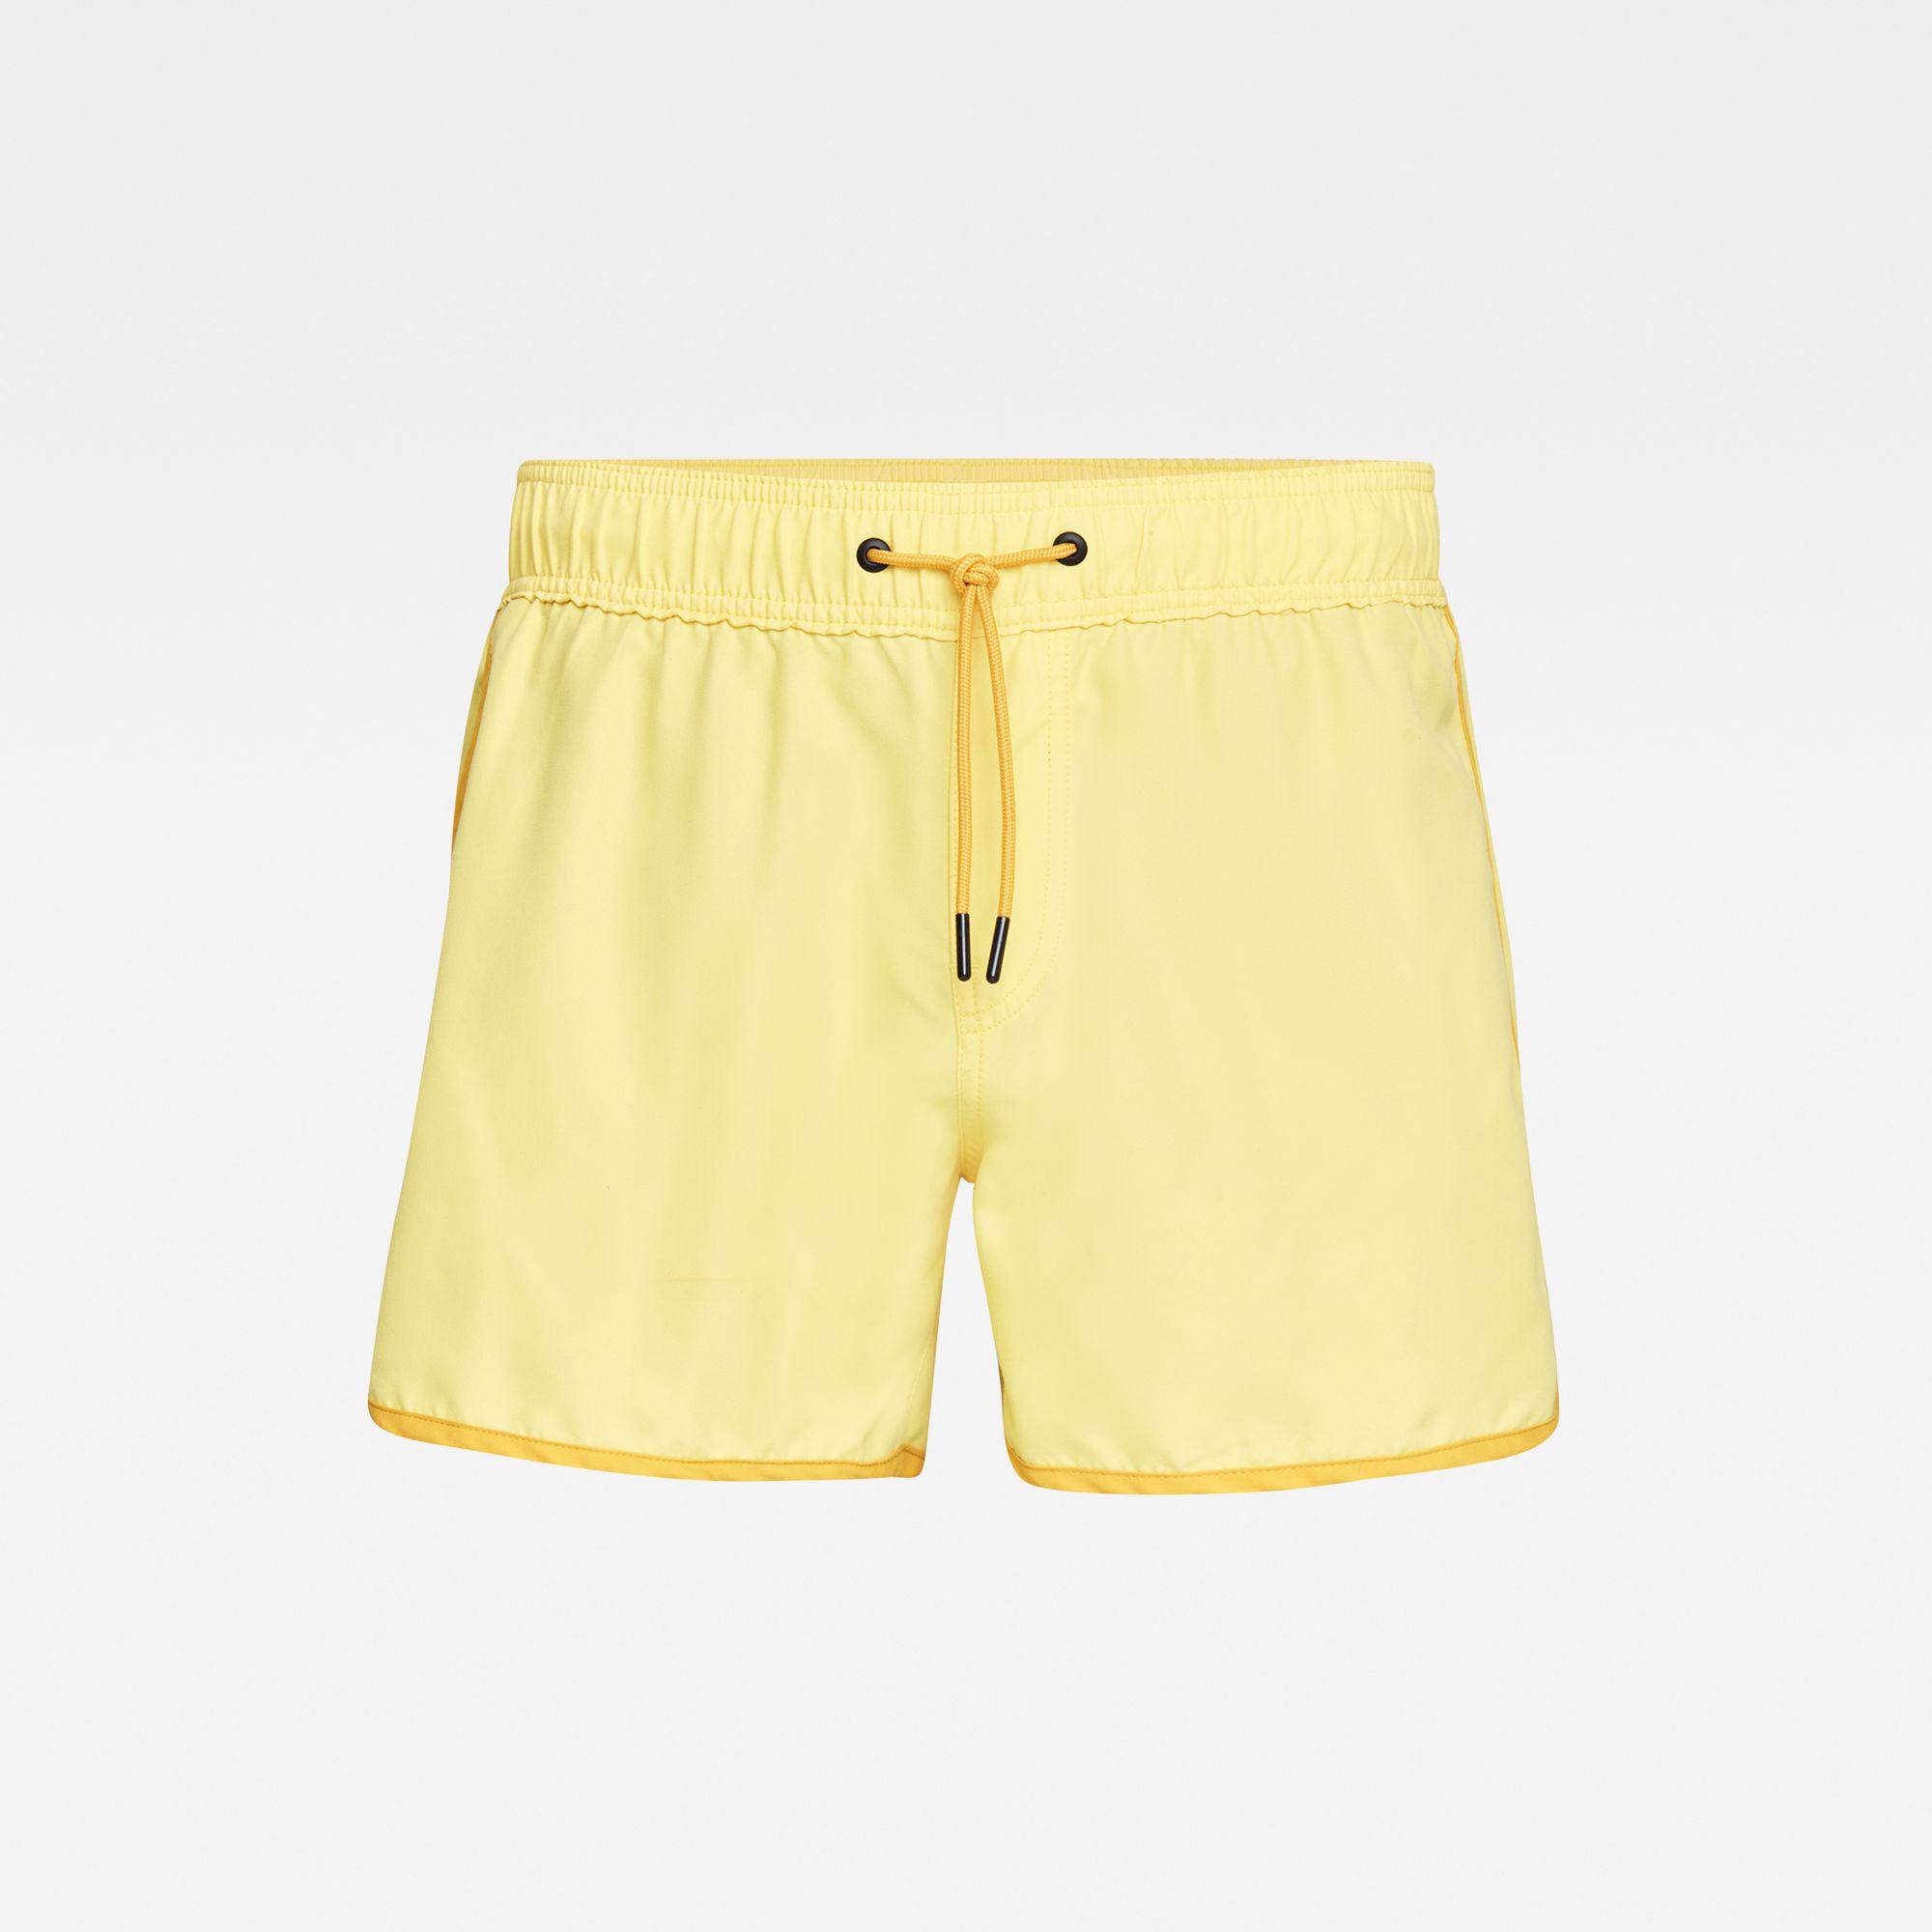 G-star RAW Hommes Short de bain Carnic Solid Jaune  - Taille: S M XS XL L XXL